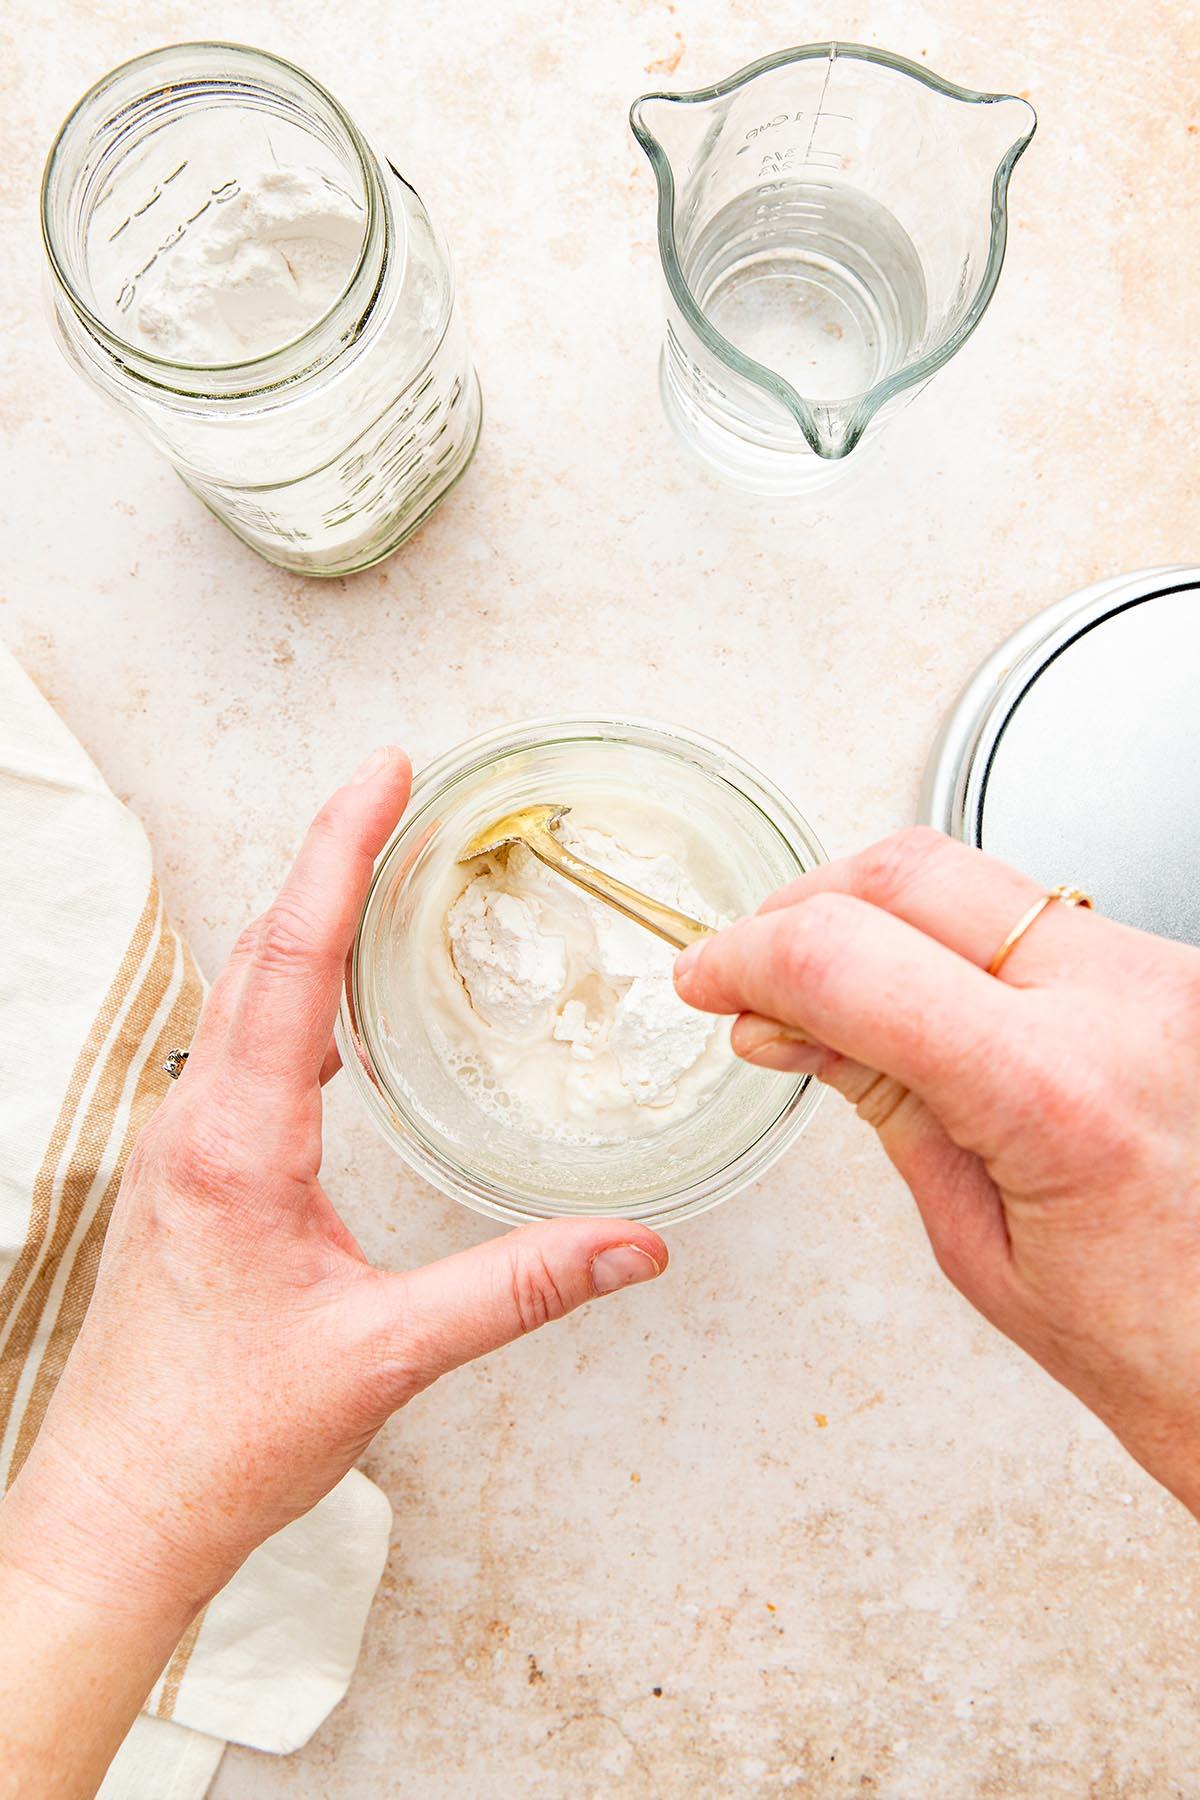 A hand using a. long spoon to stir a jar of sourdough starter.